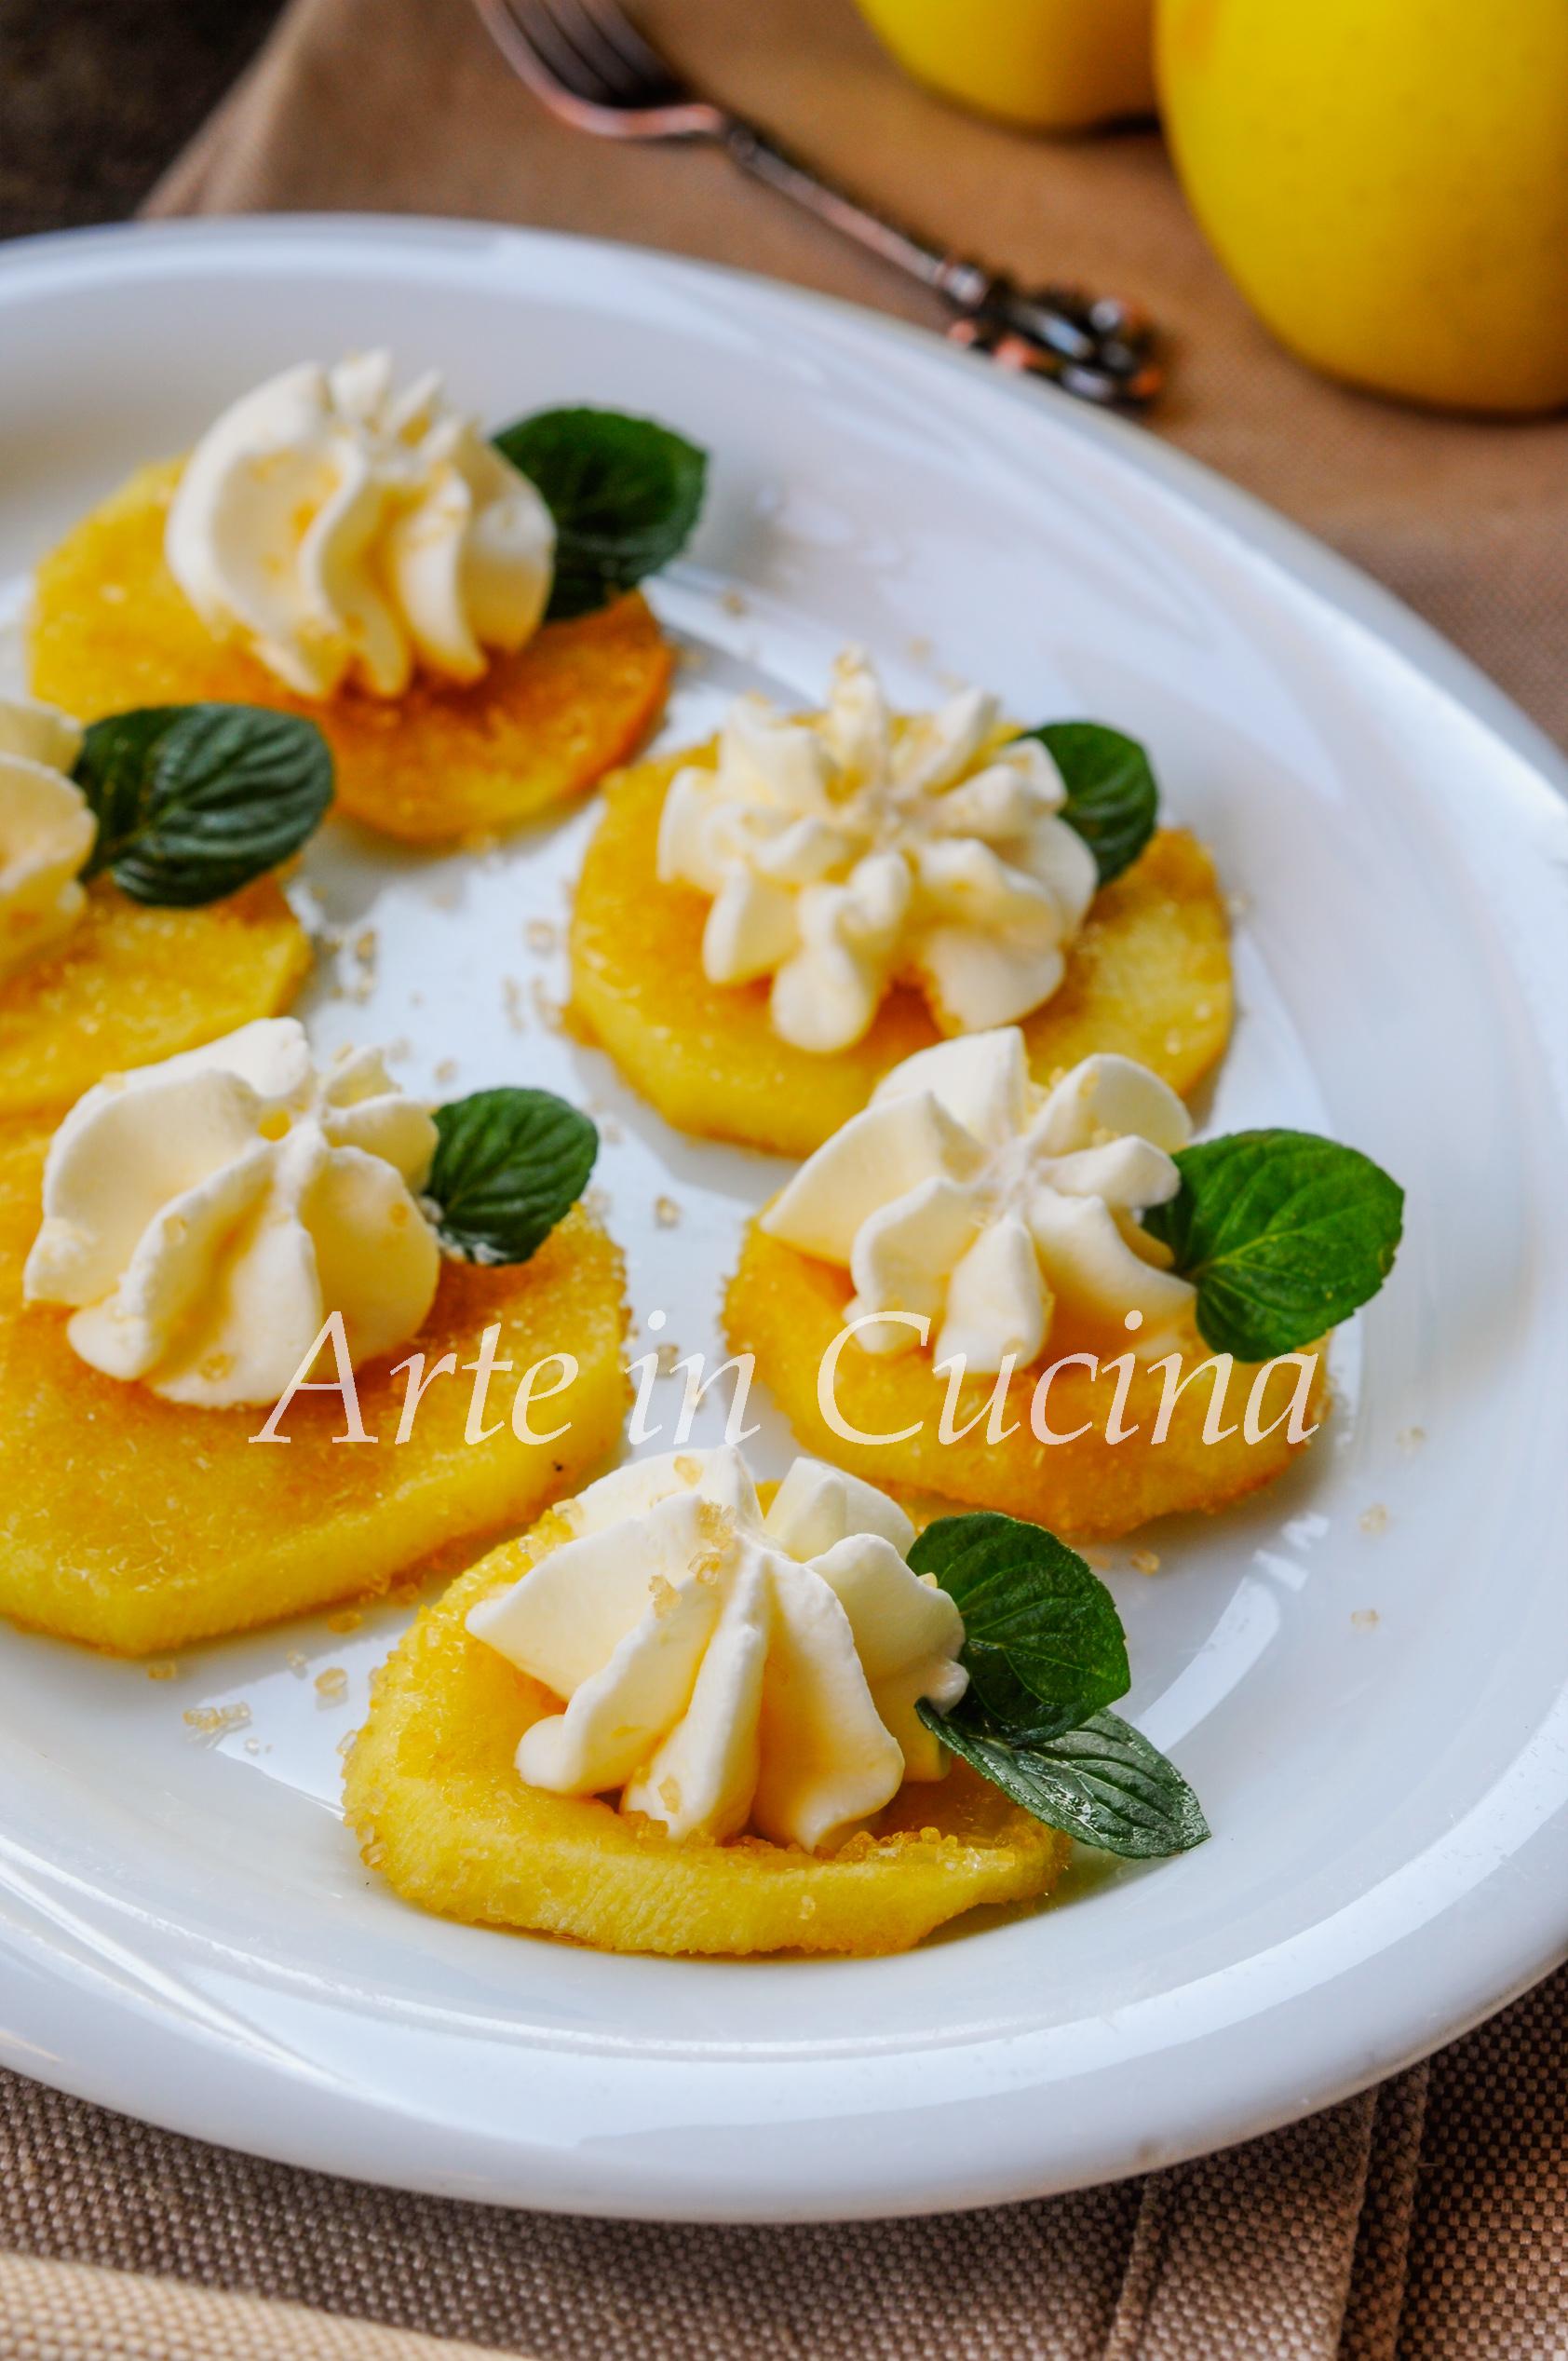 Mele grigliate con crema veloce vickyart arte in cucina